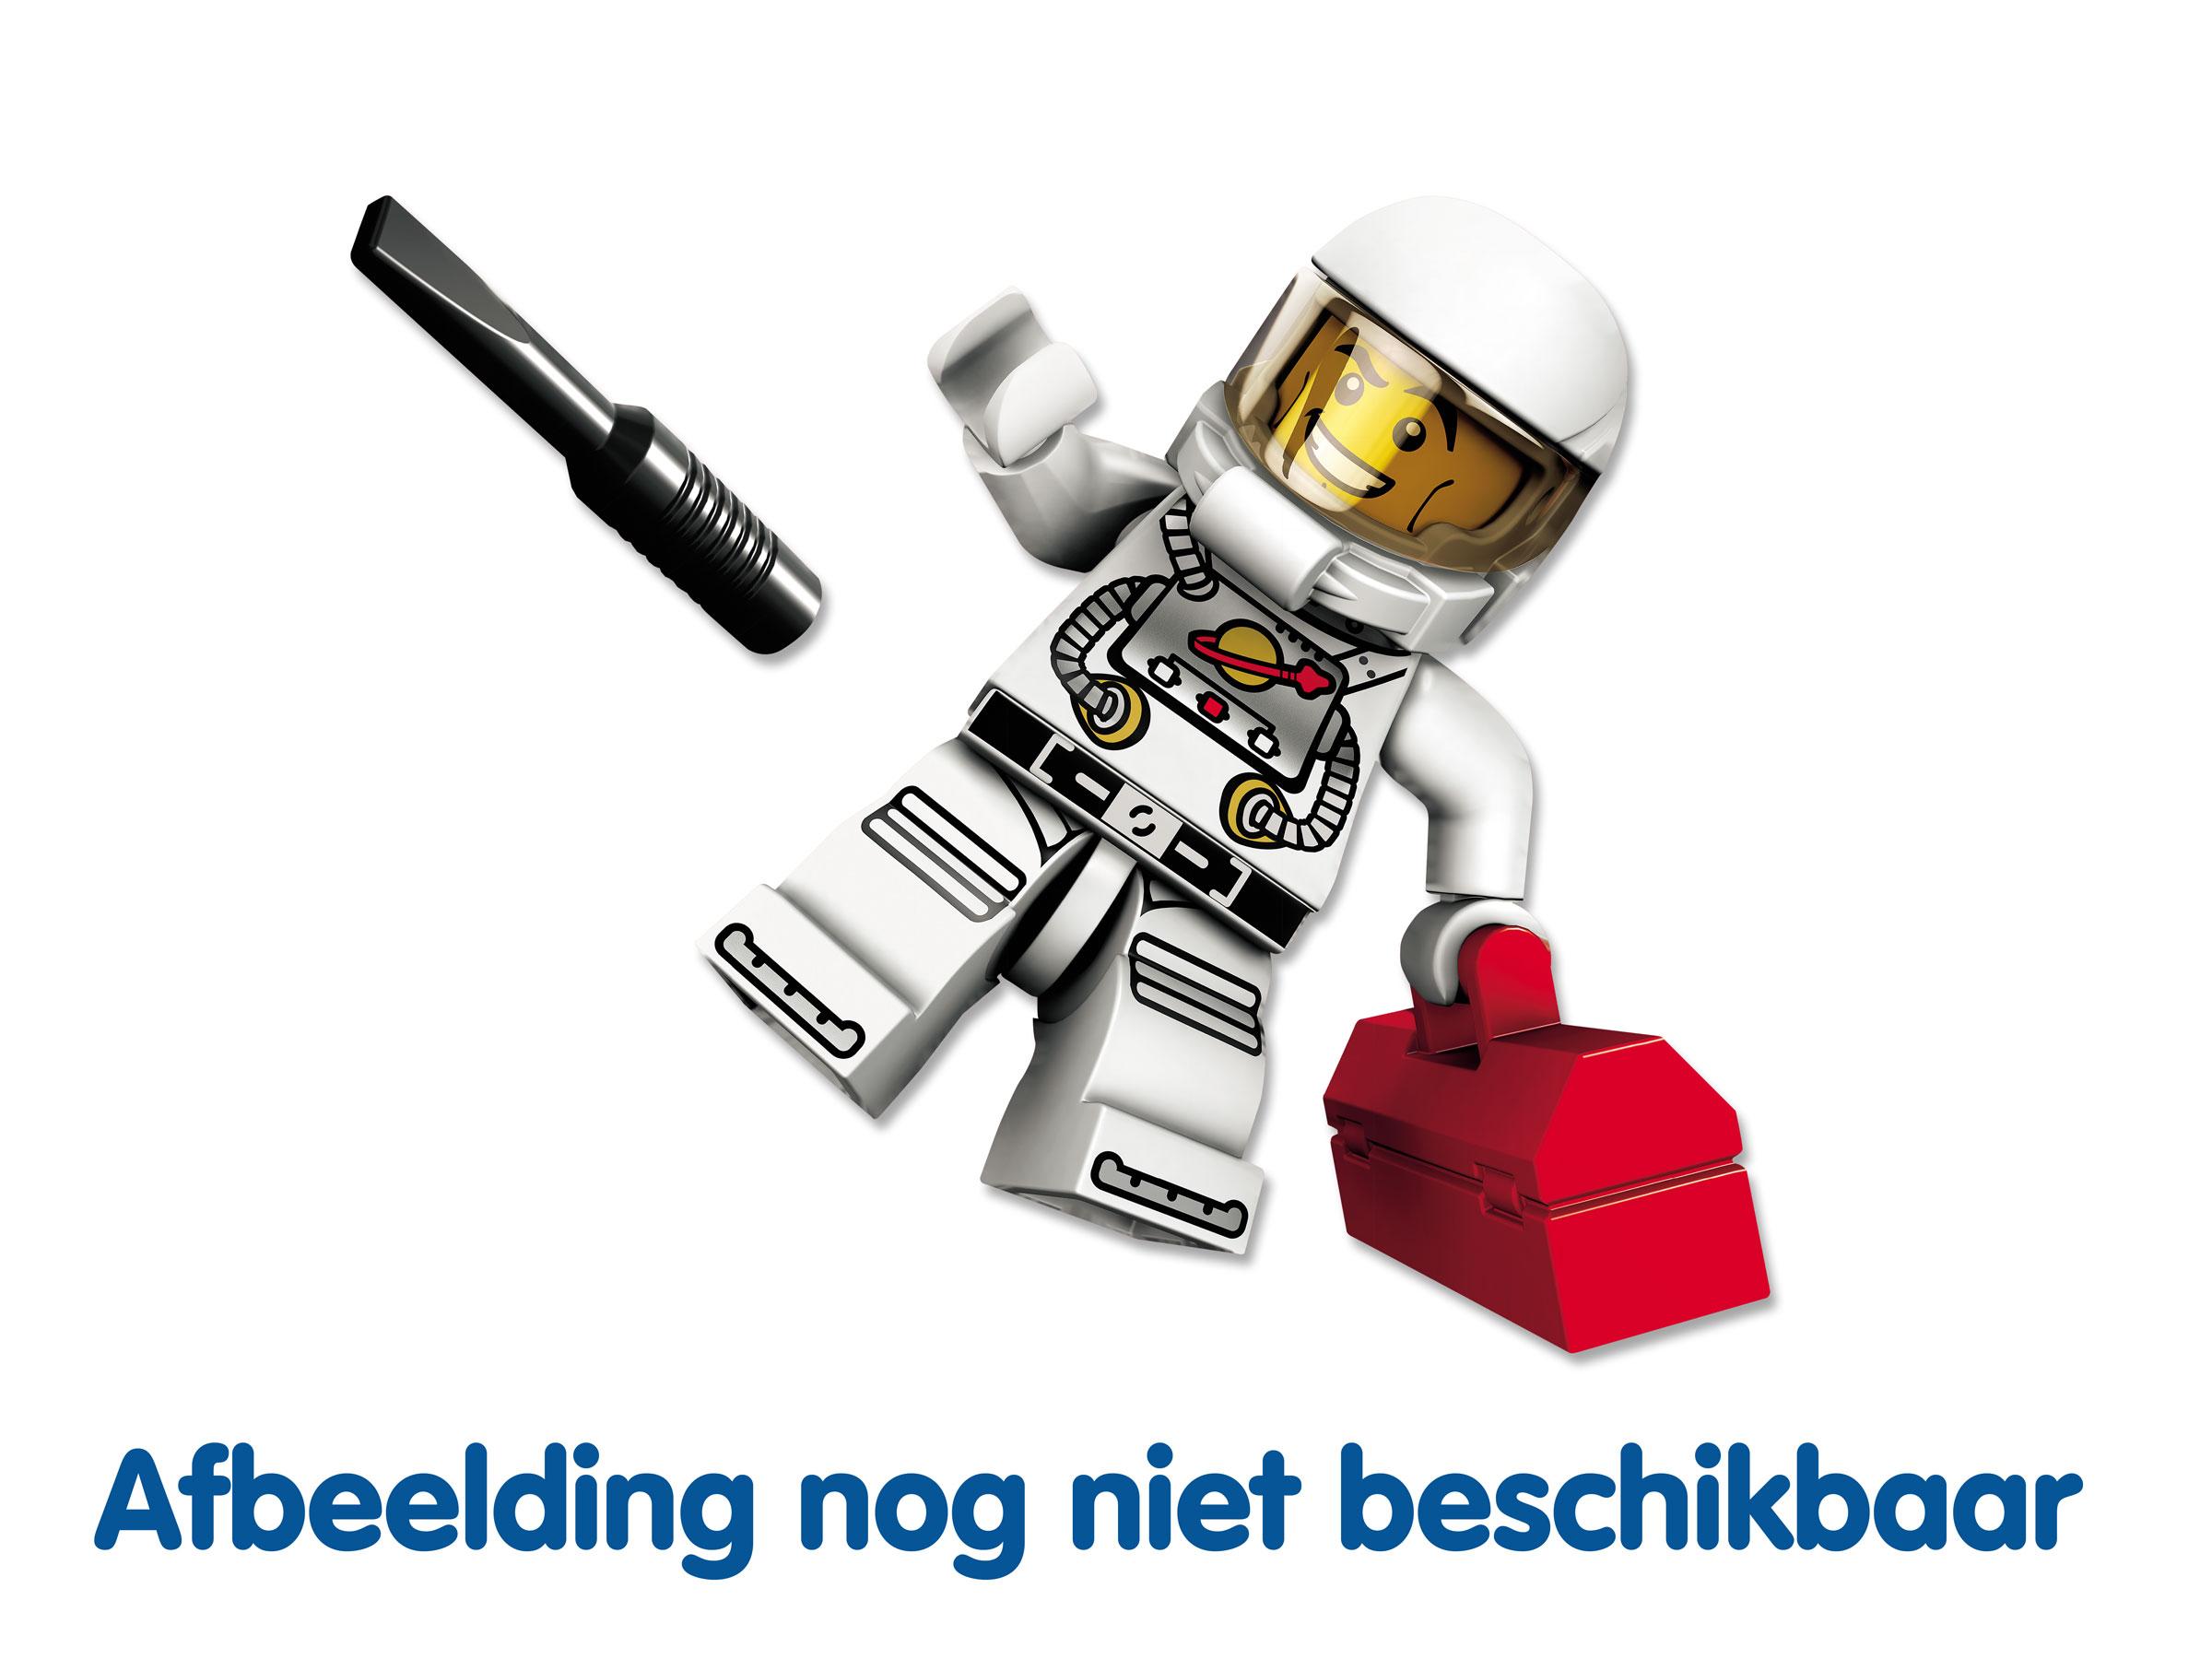 LEGO Chima 70144 Lavals Vuurleeuw